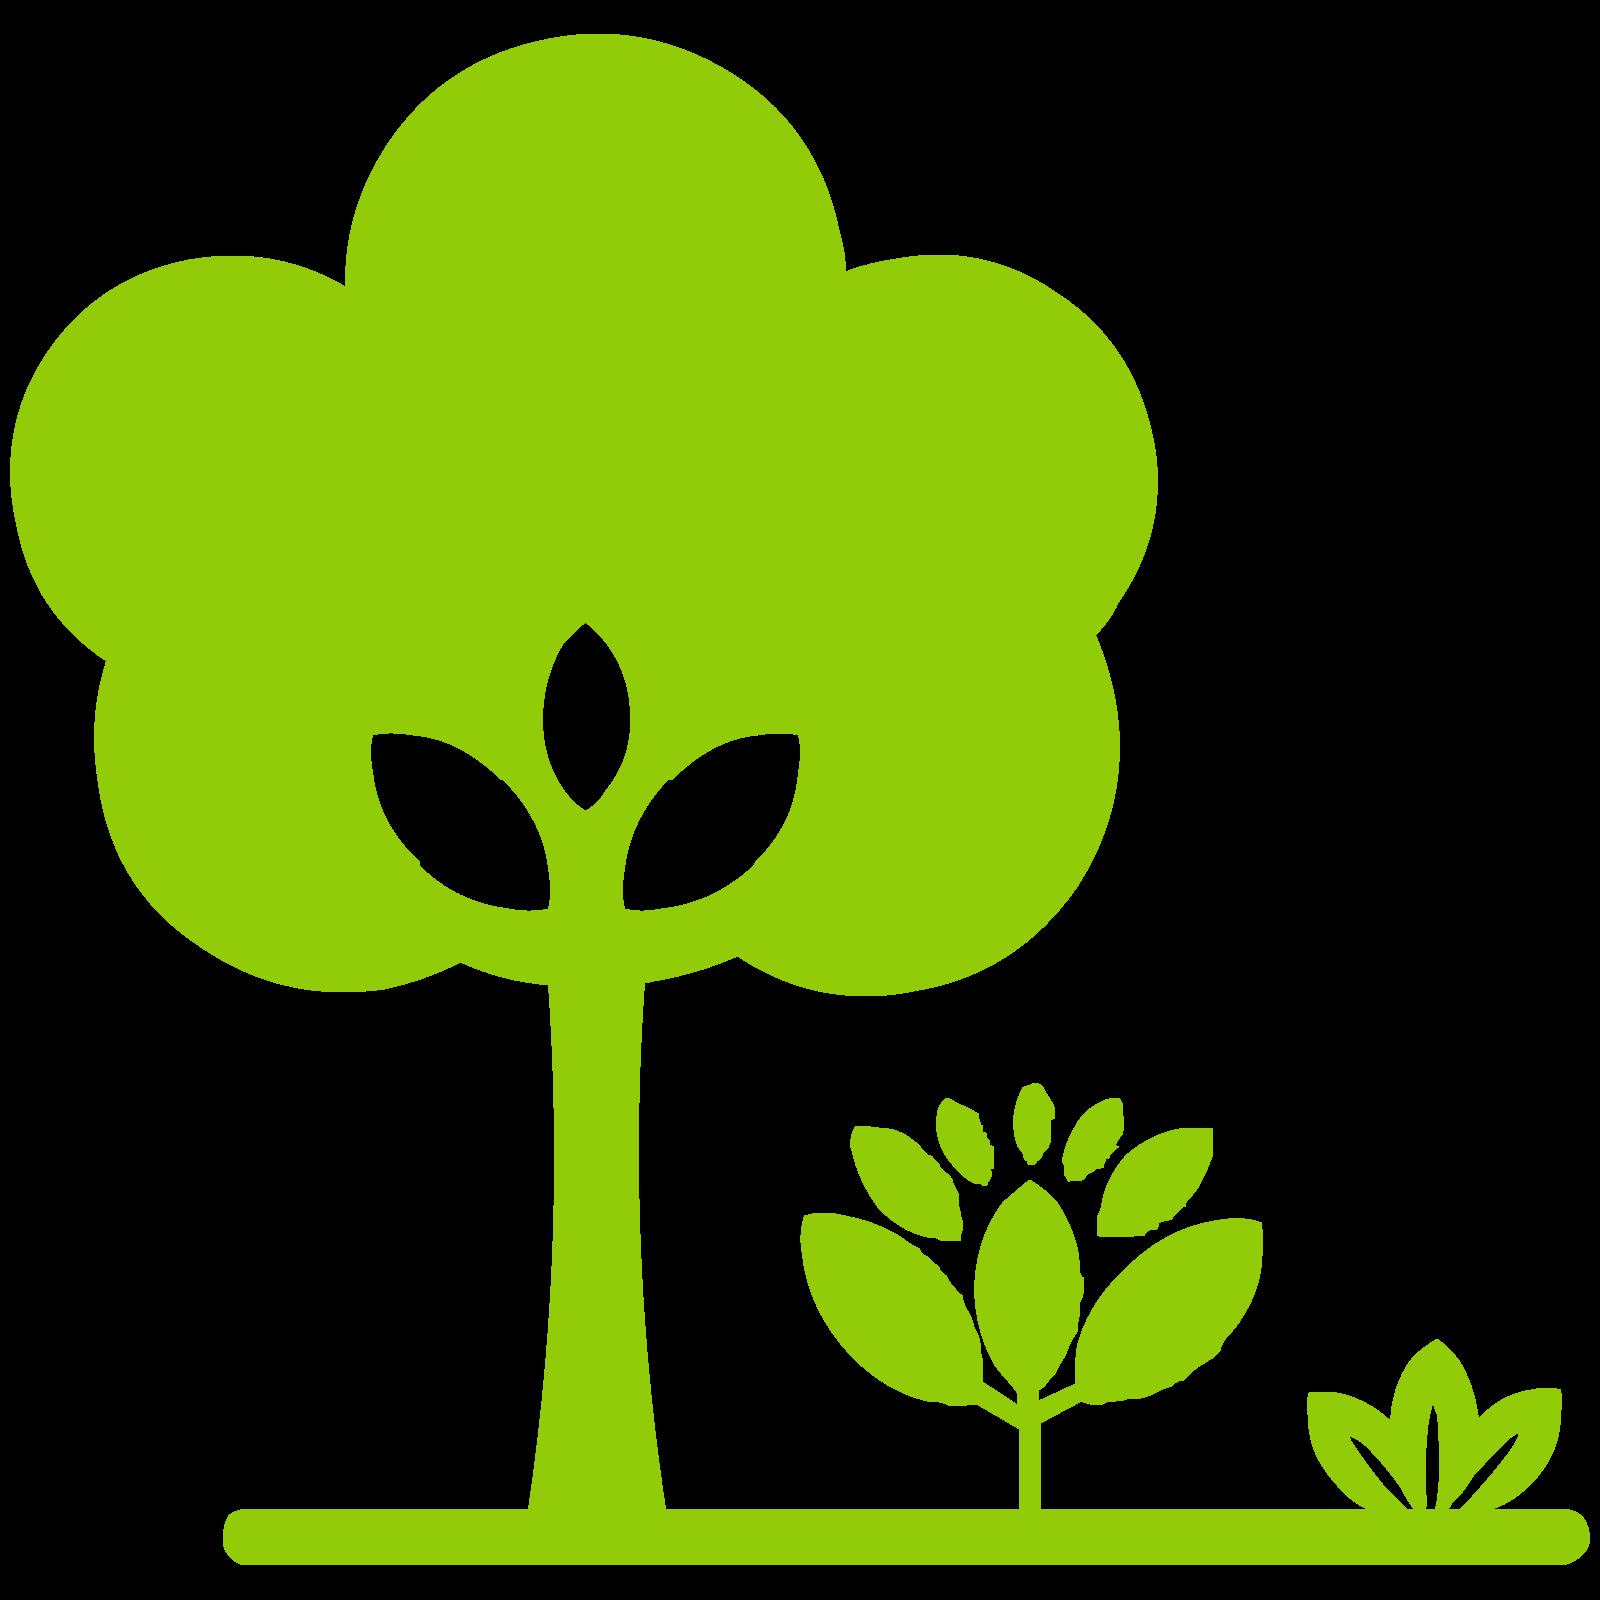 bahce-icon